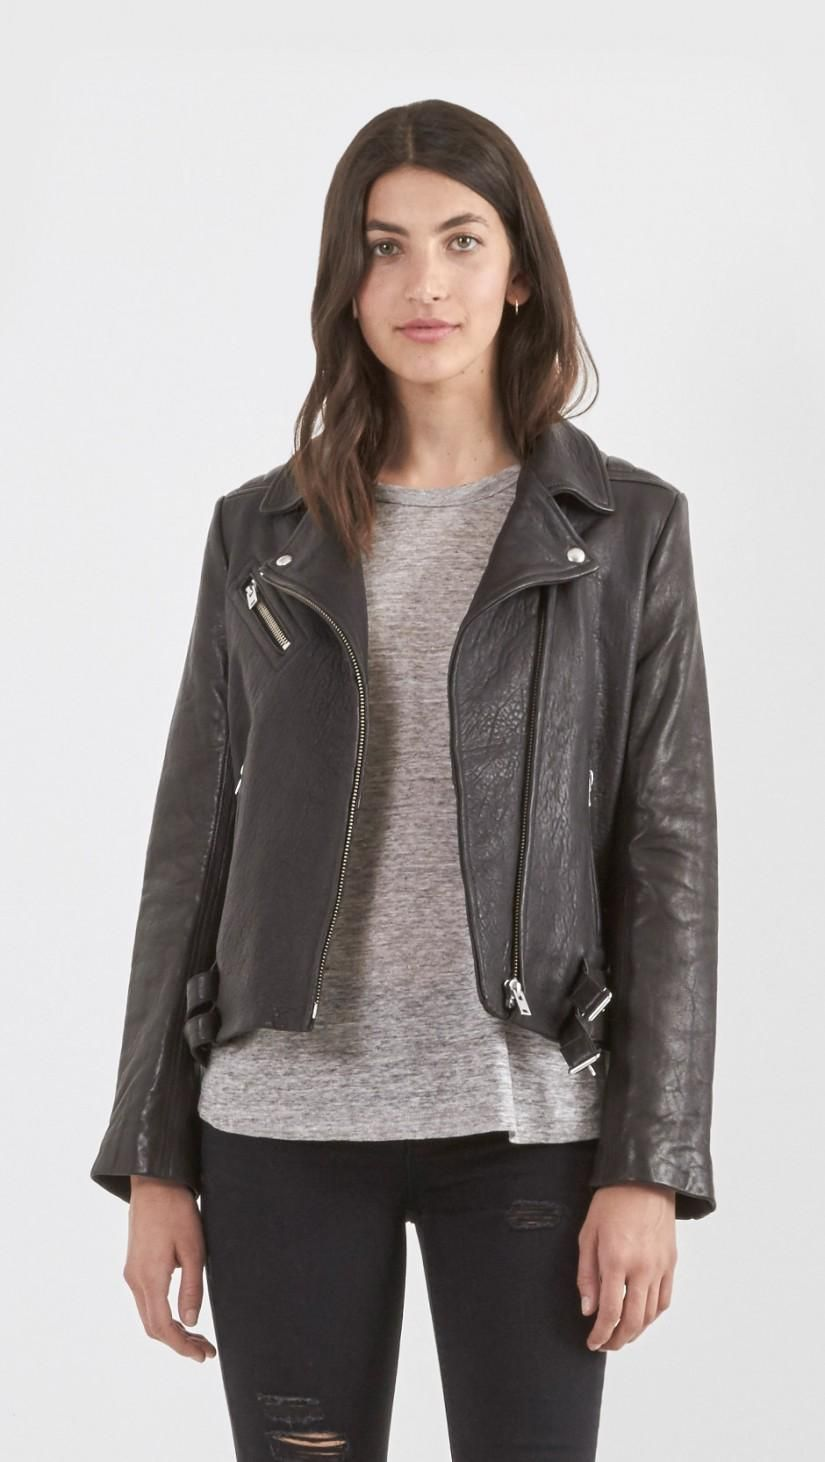 Iro Joneson Leather Jacket In Black Jackets Clothes Design Black Leather Jacket [ 1462 x 825 Pixel ]